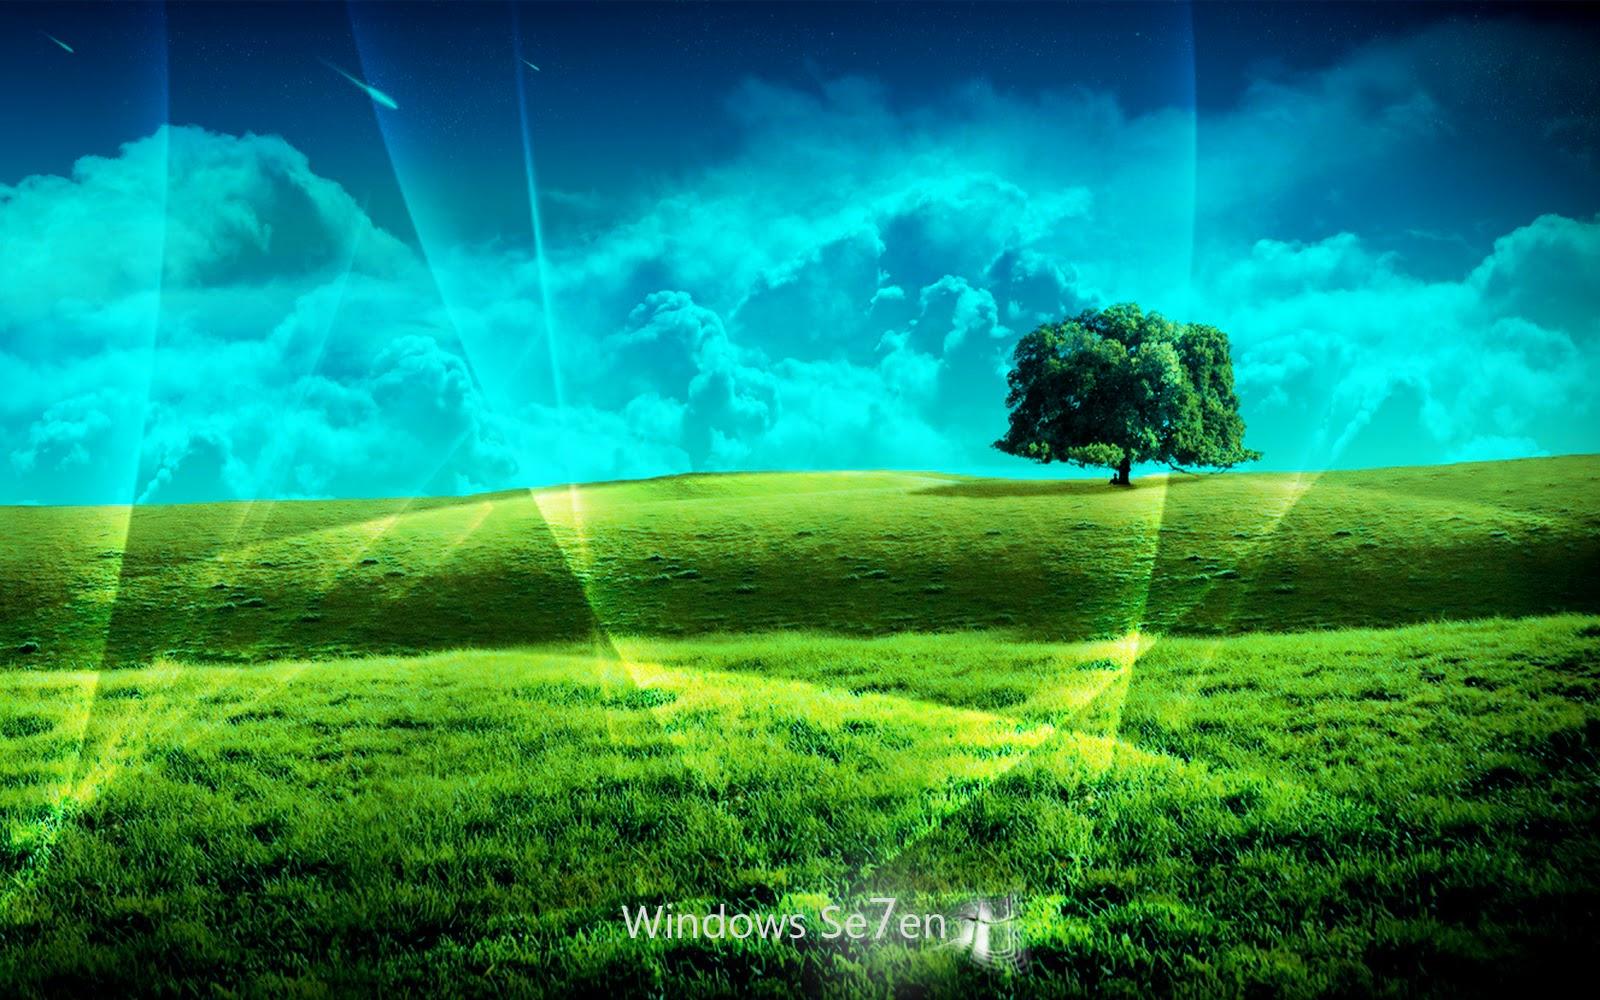 Free animated wallpaper windows 7 - Windows animated wallpaper ...